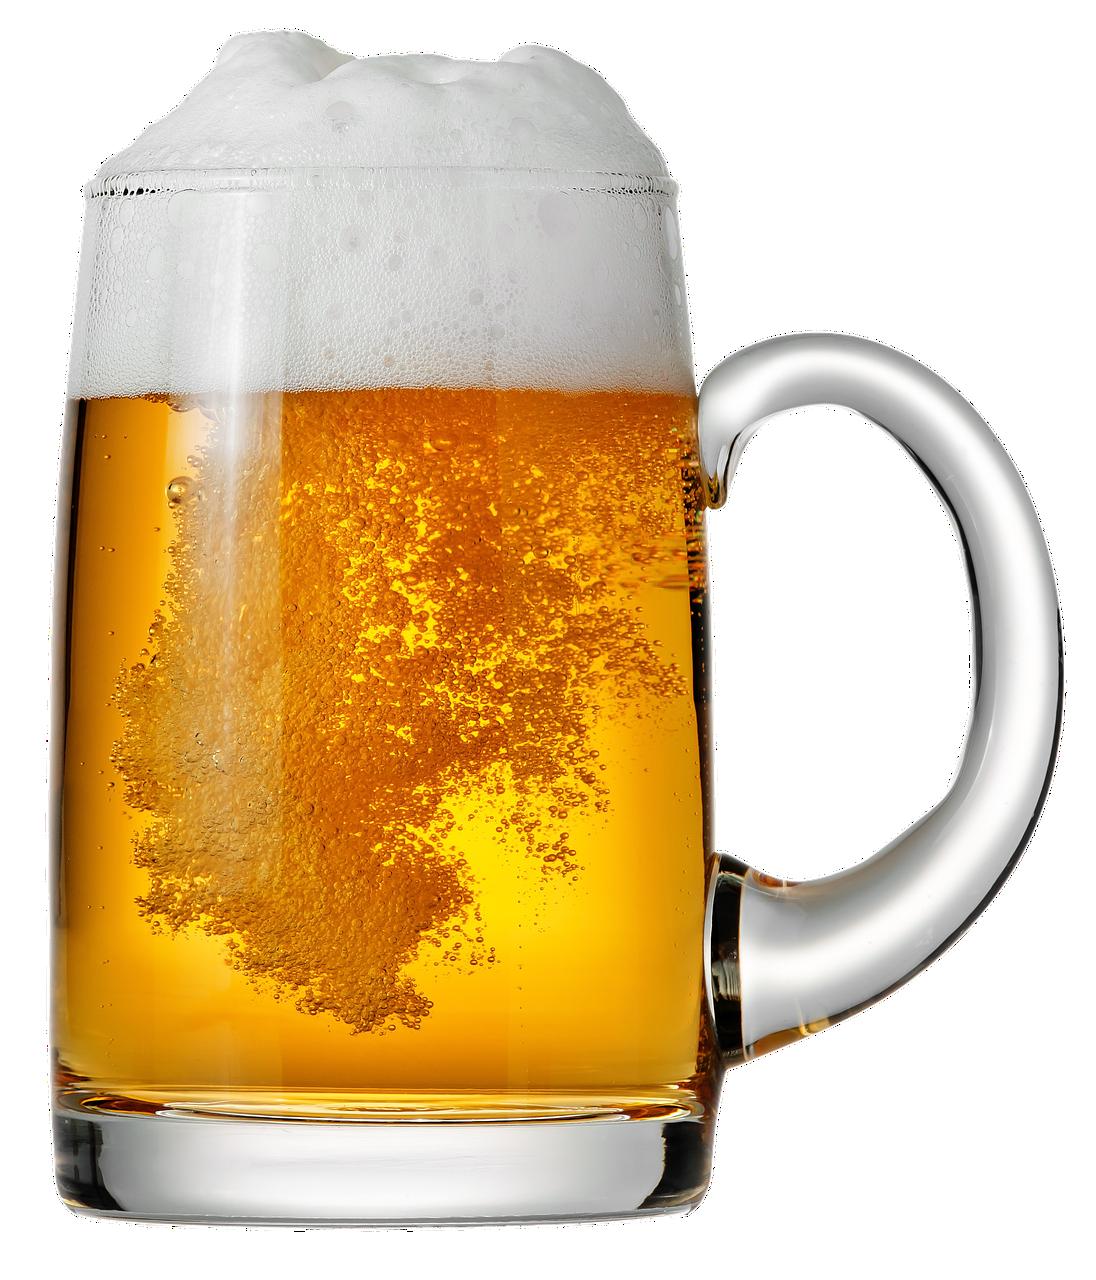 cerveza, jarro de cerveza, espuma